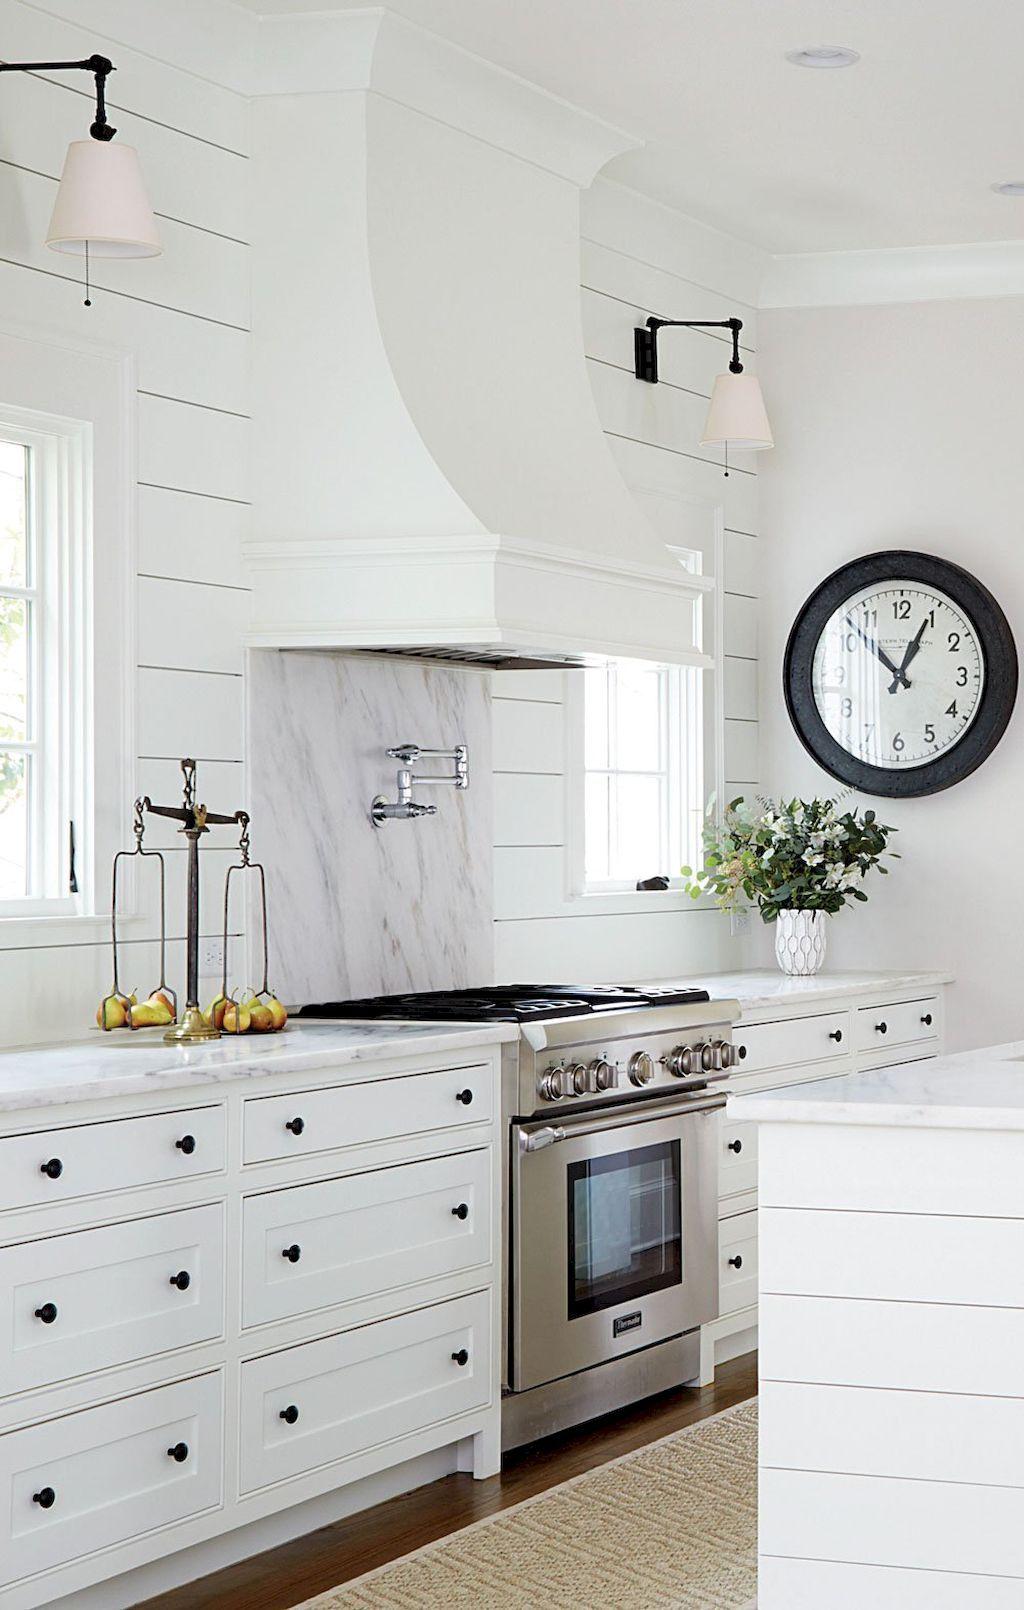 60 Fancy Farmhouse Kitchen Backsplash Decor Ideas 31 Farmhouse